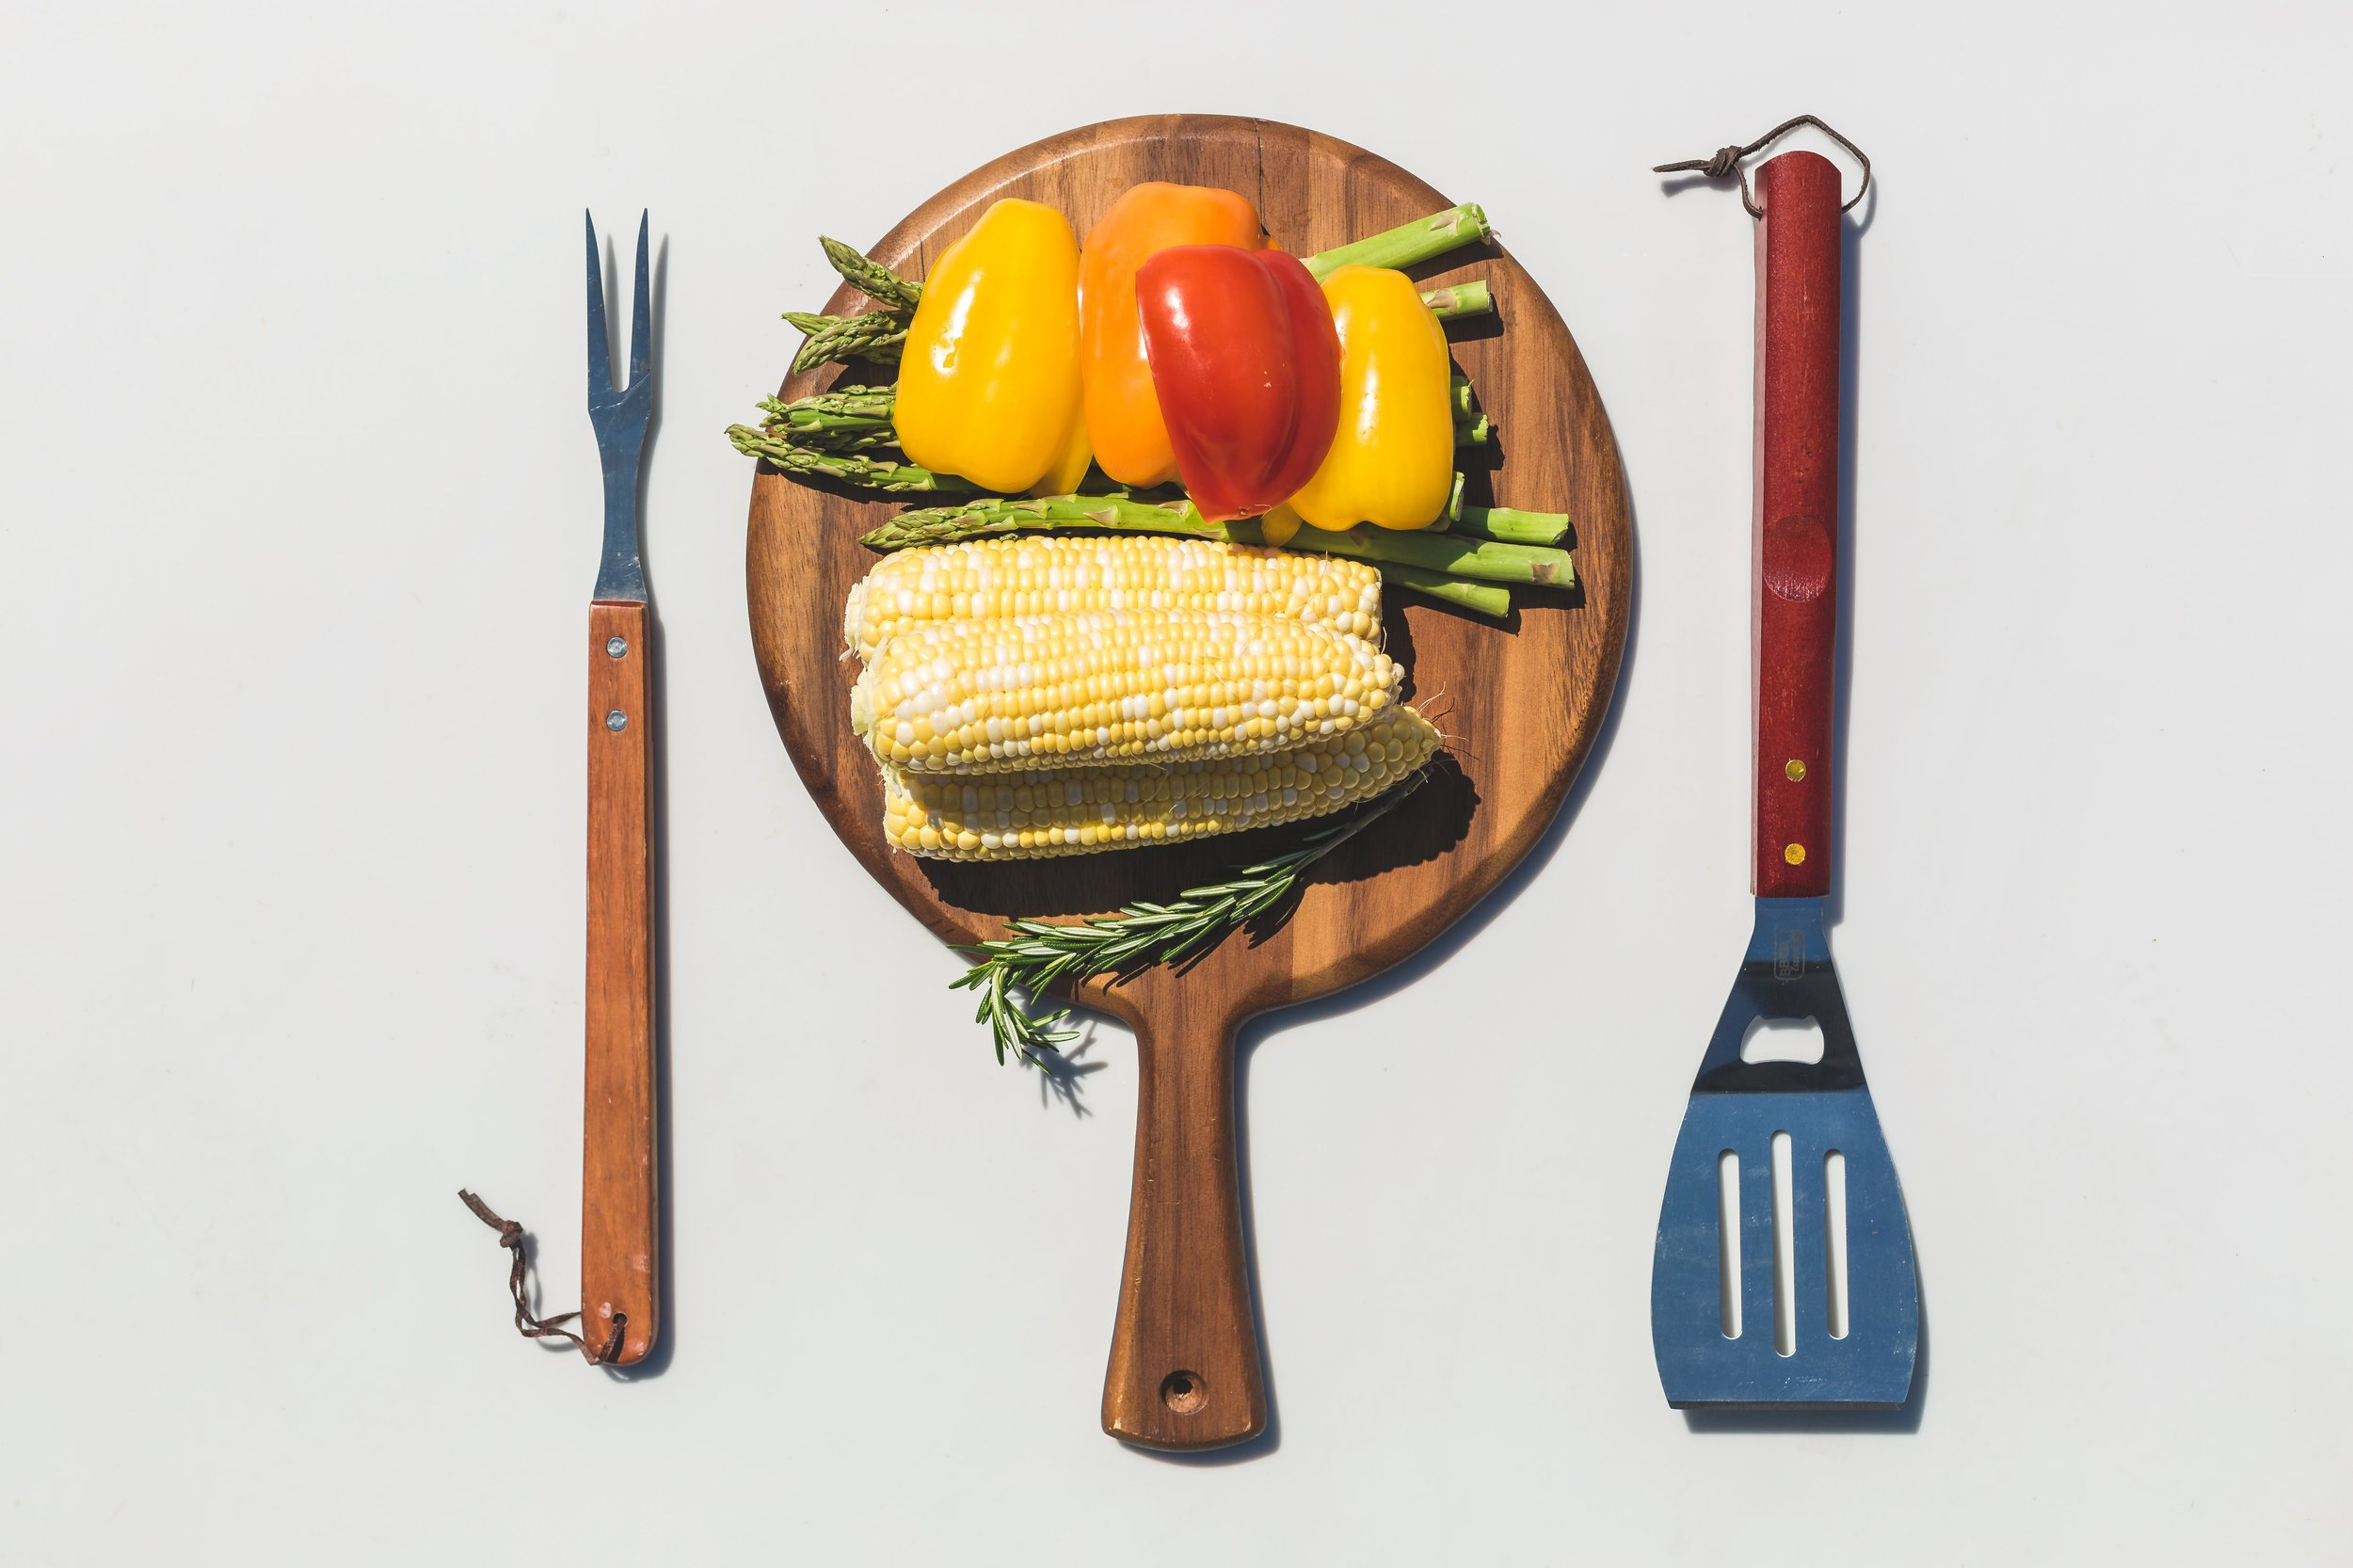 veggies-cutting-board-grill-tools.jpg